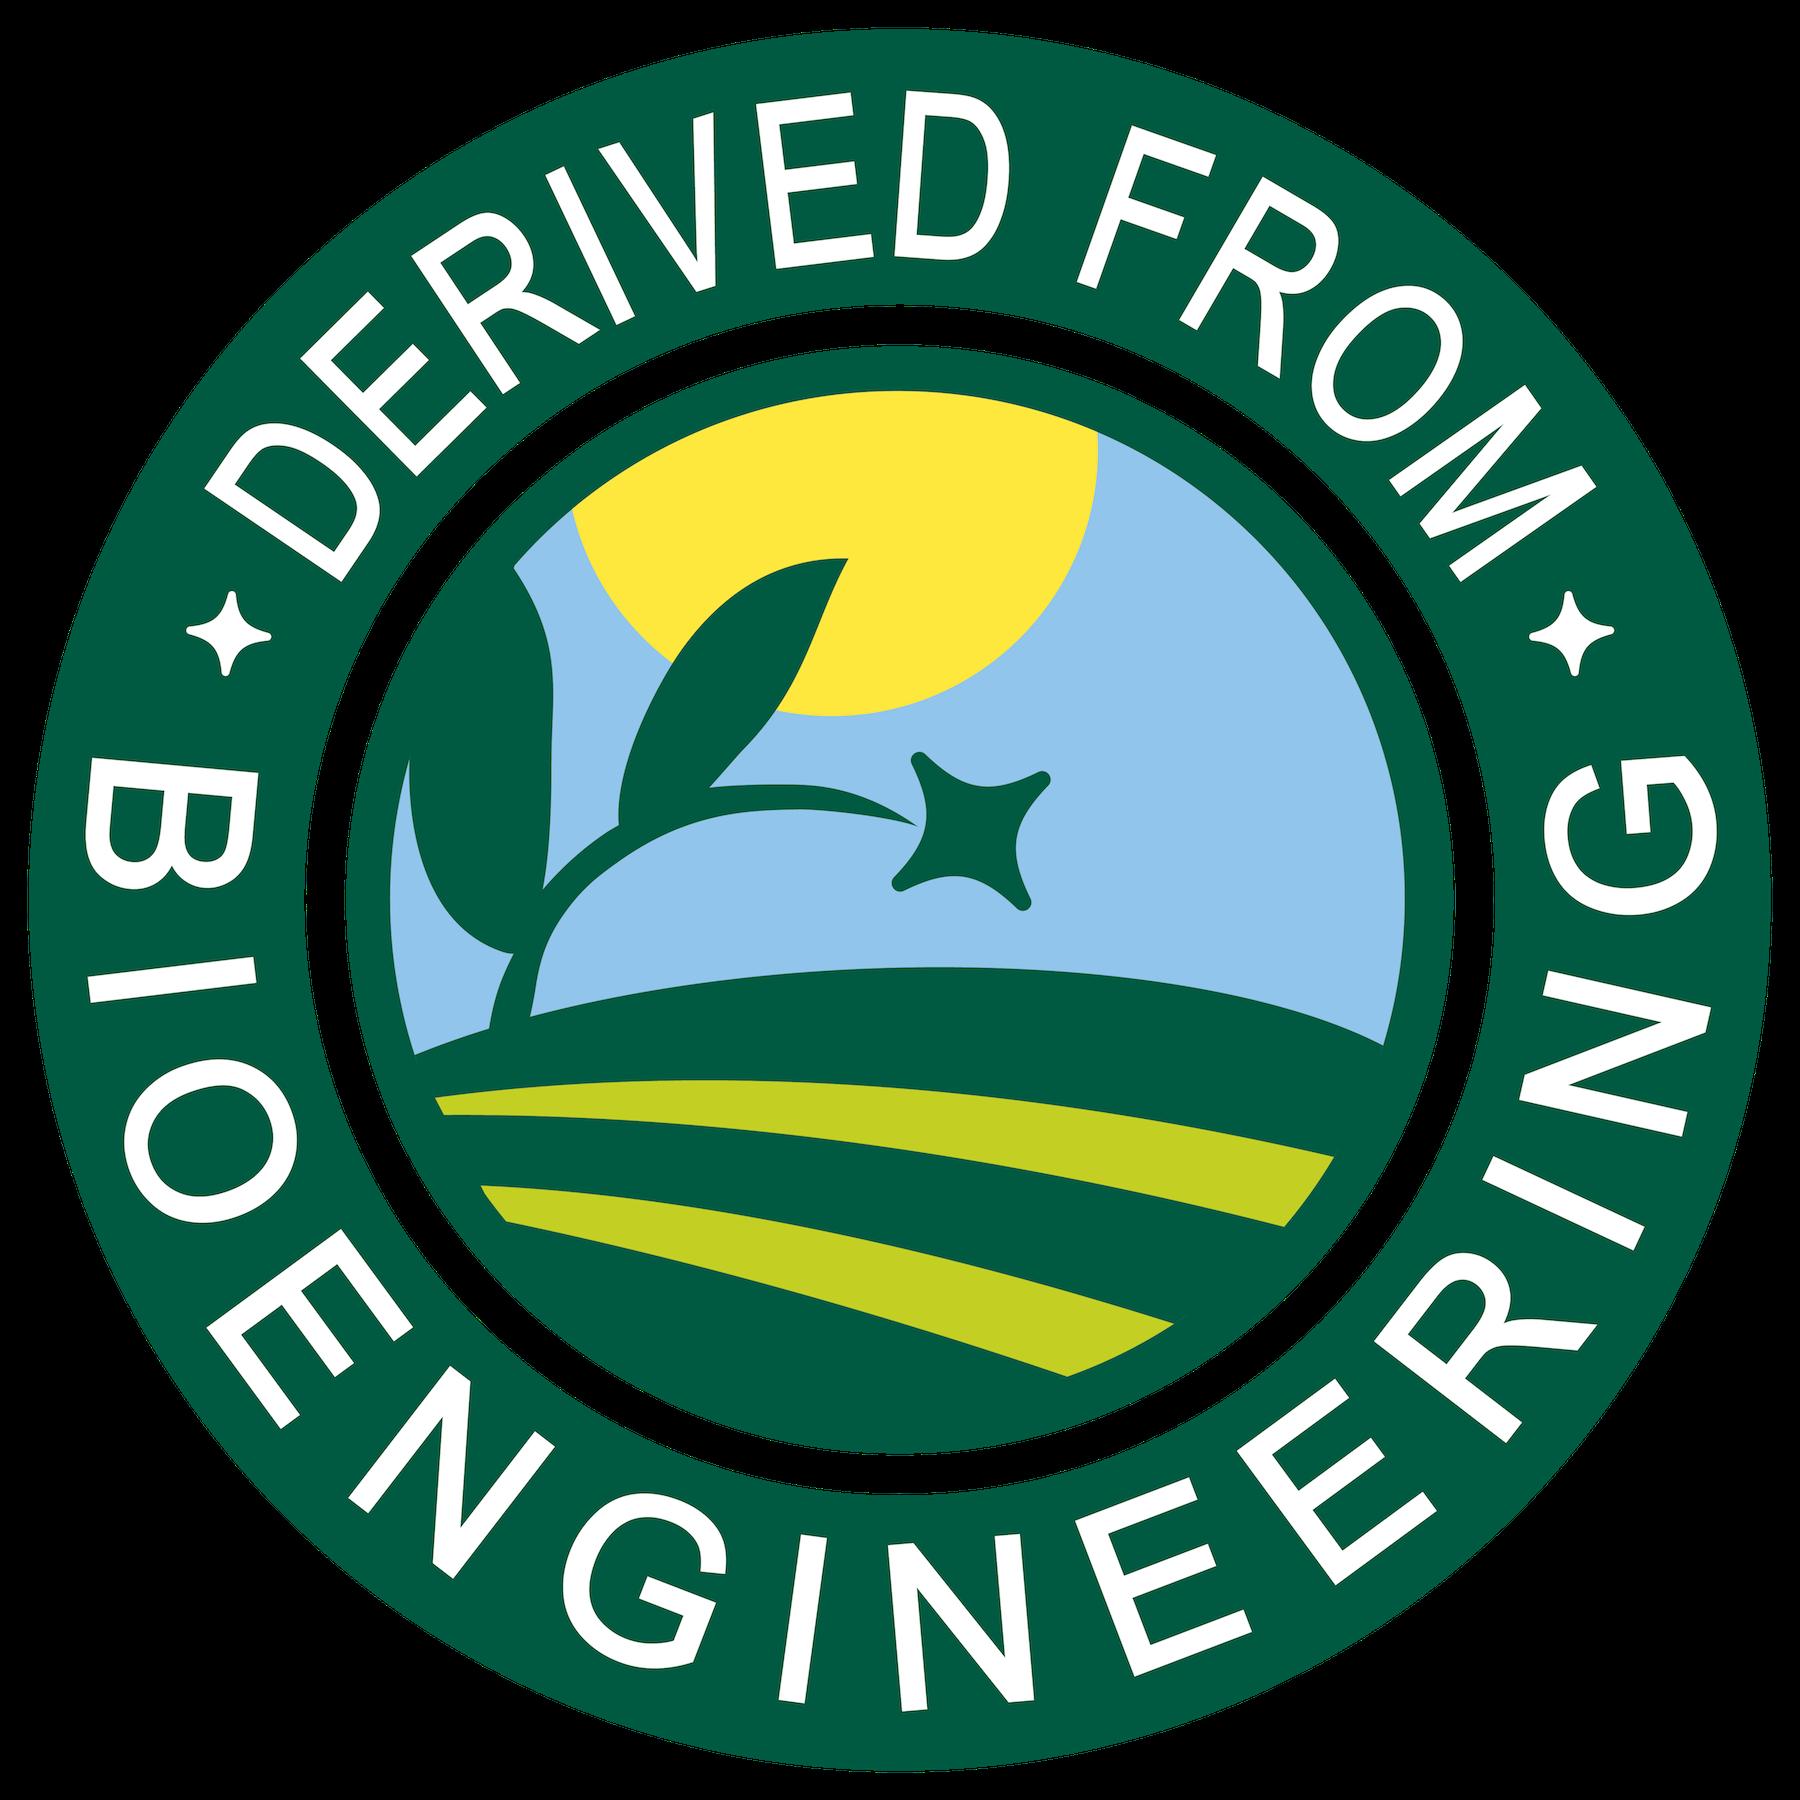 bioengineered.png